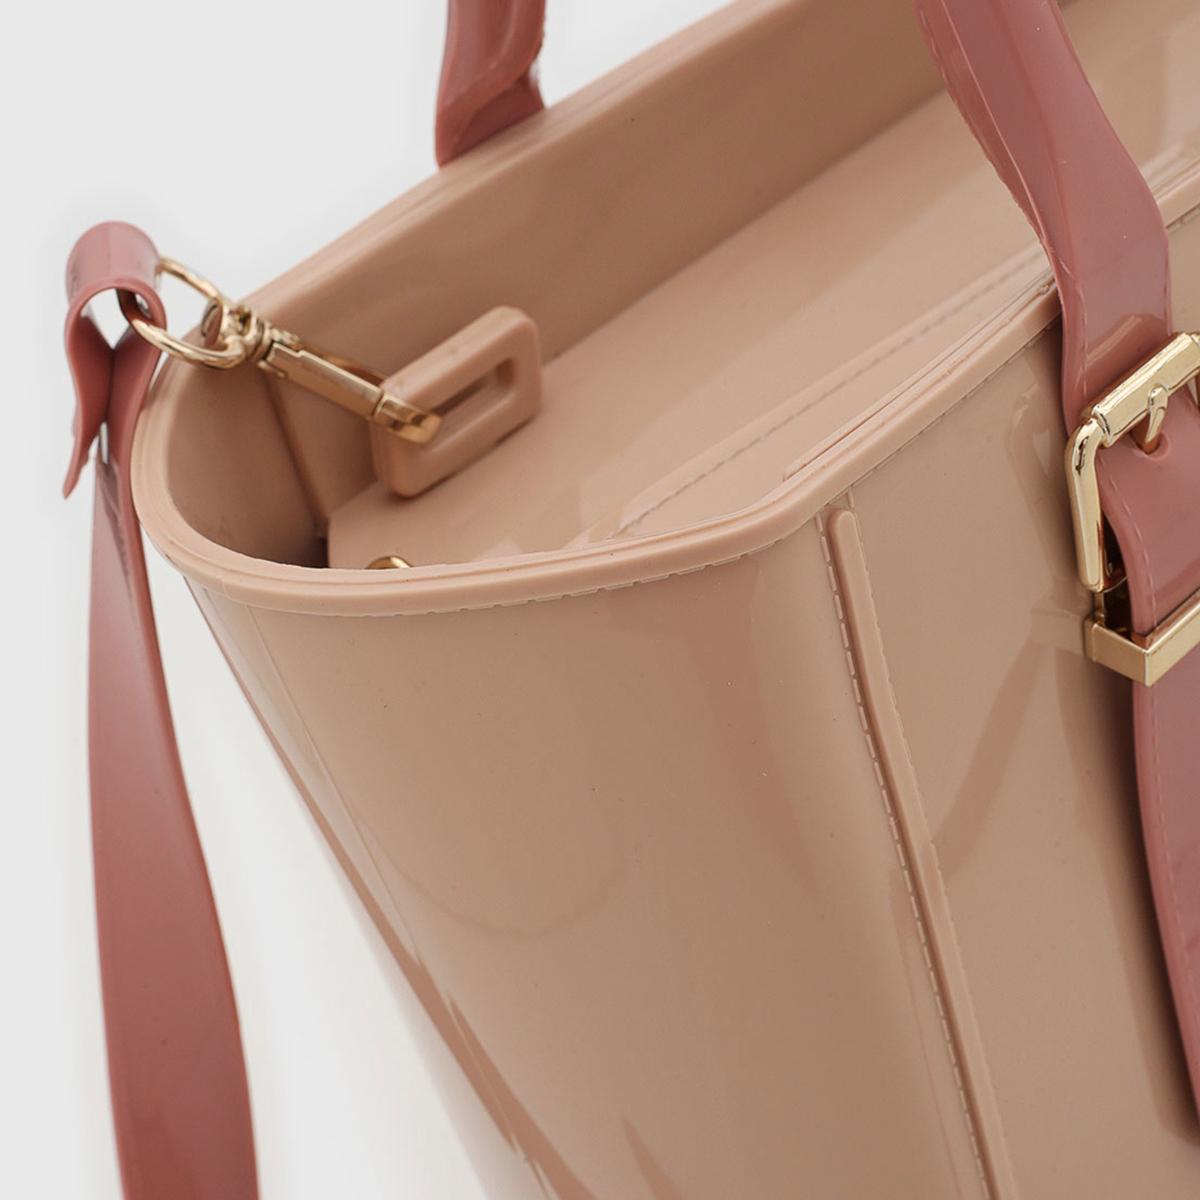 Bolsa Petite Jolie PJ10012 Daily Bag